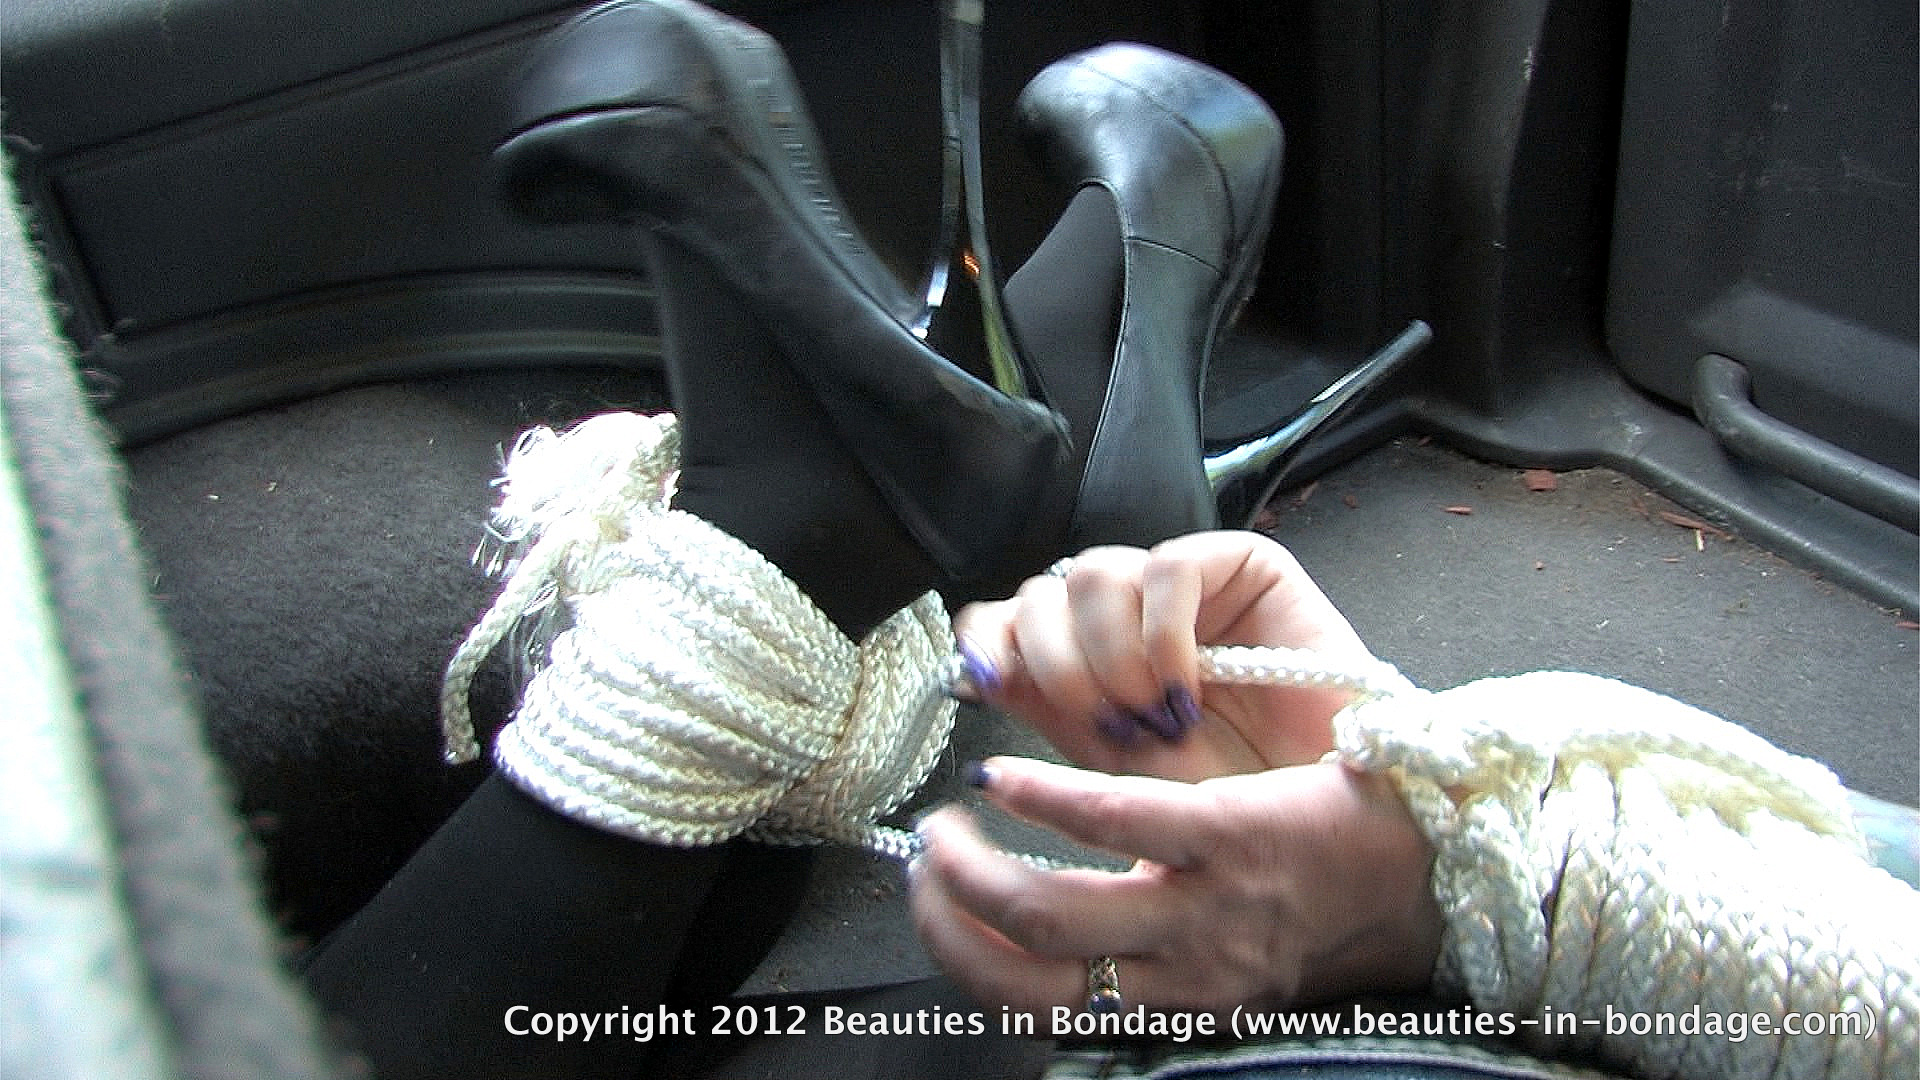 Damsel in distress bondage video very erotic!